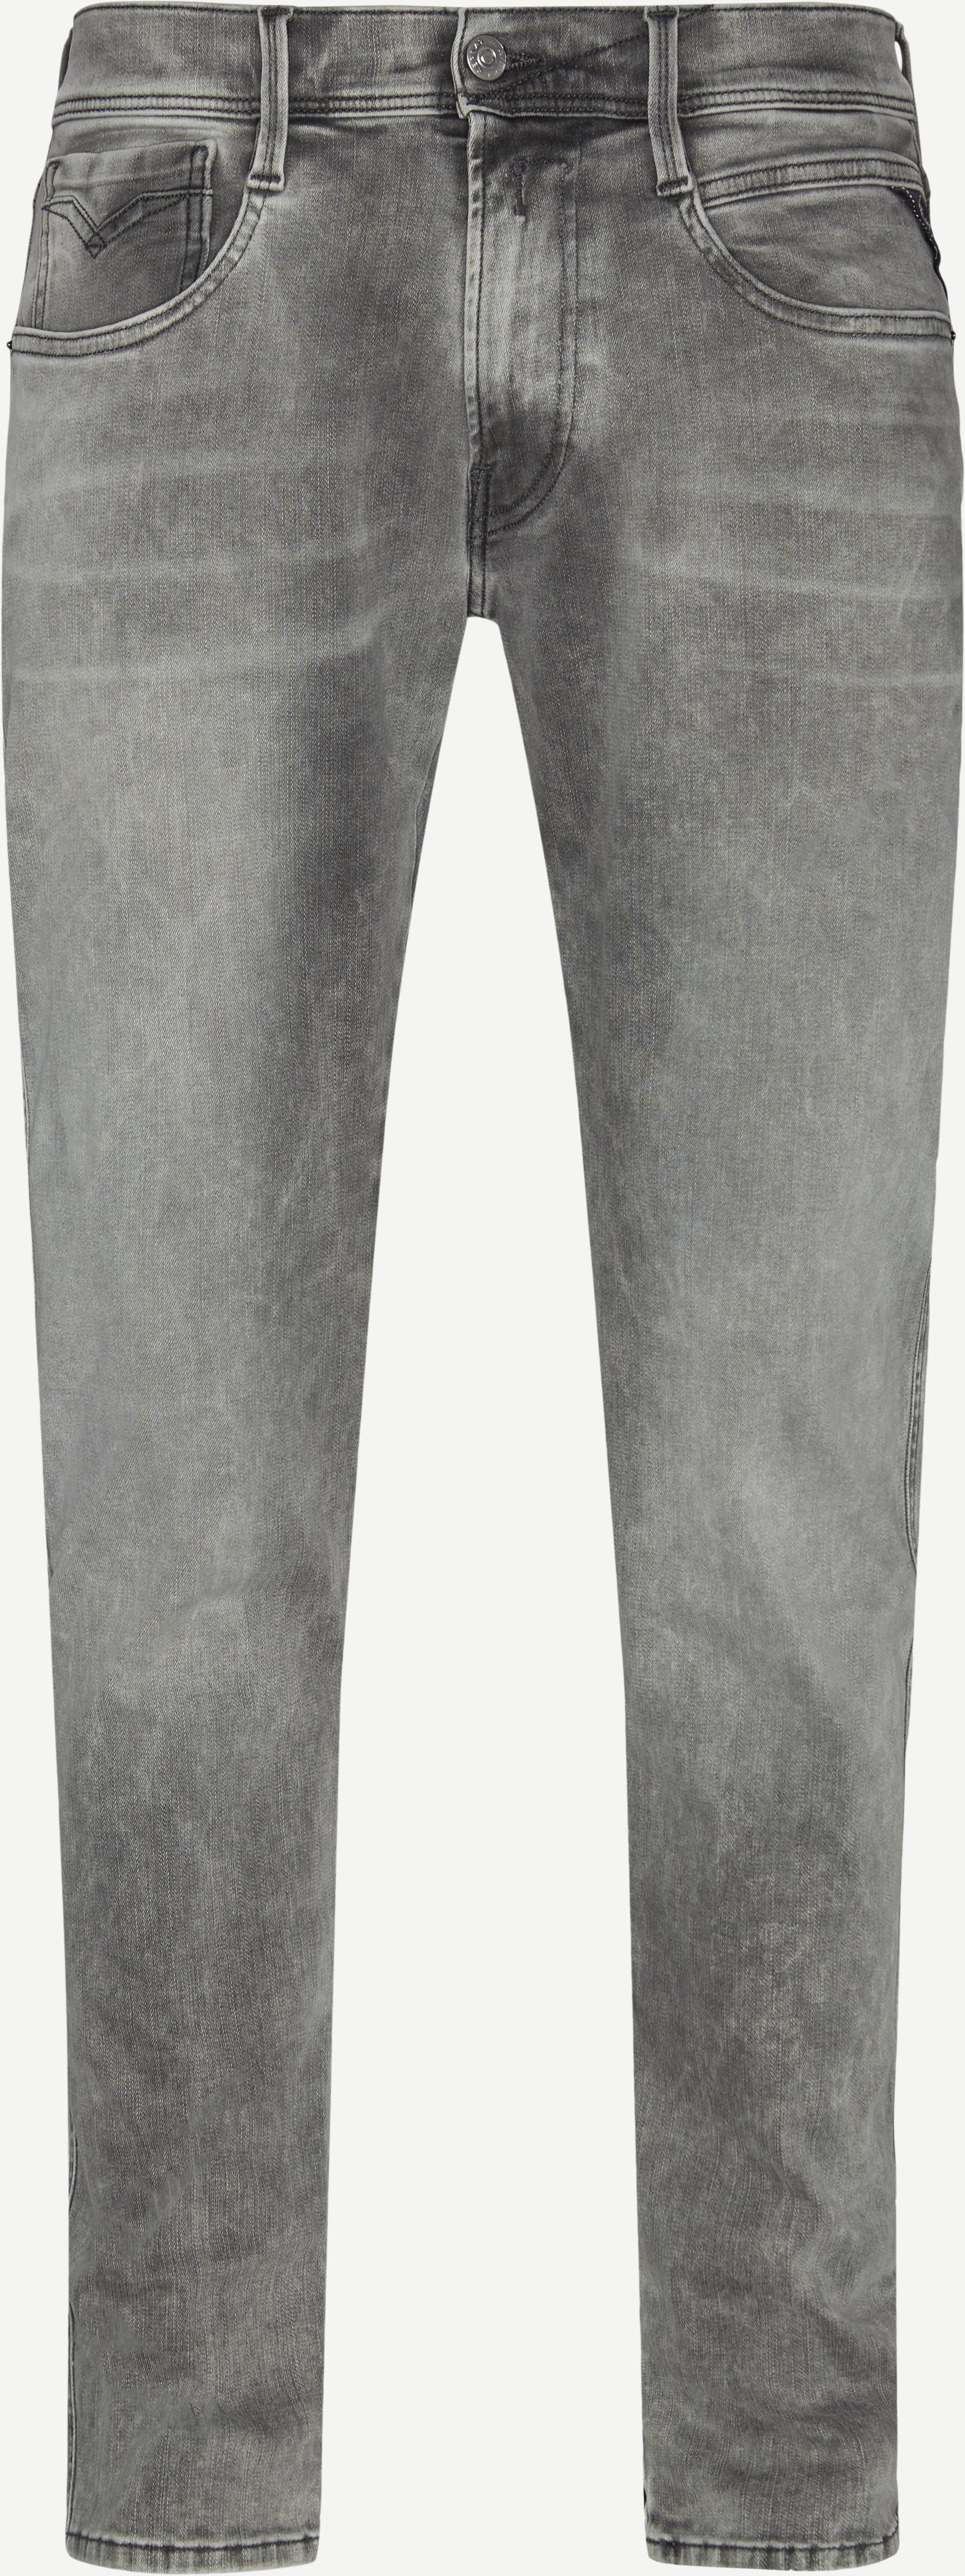 Jeans - Slim - Grå